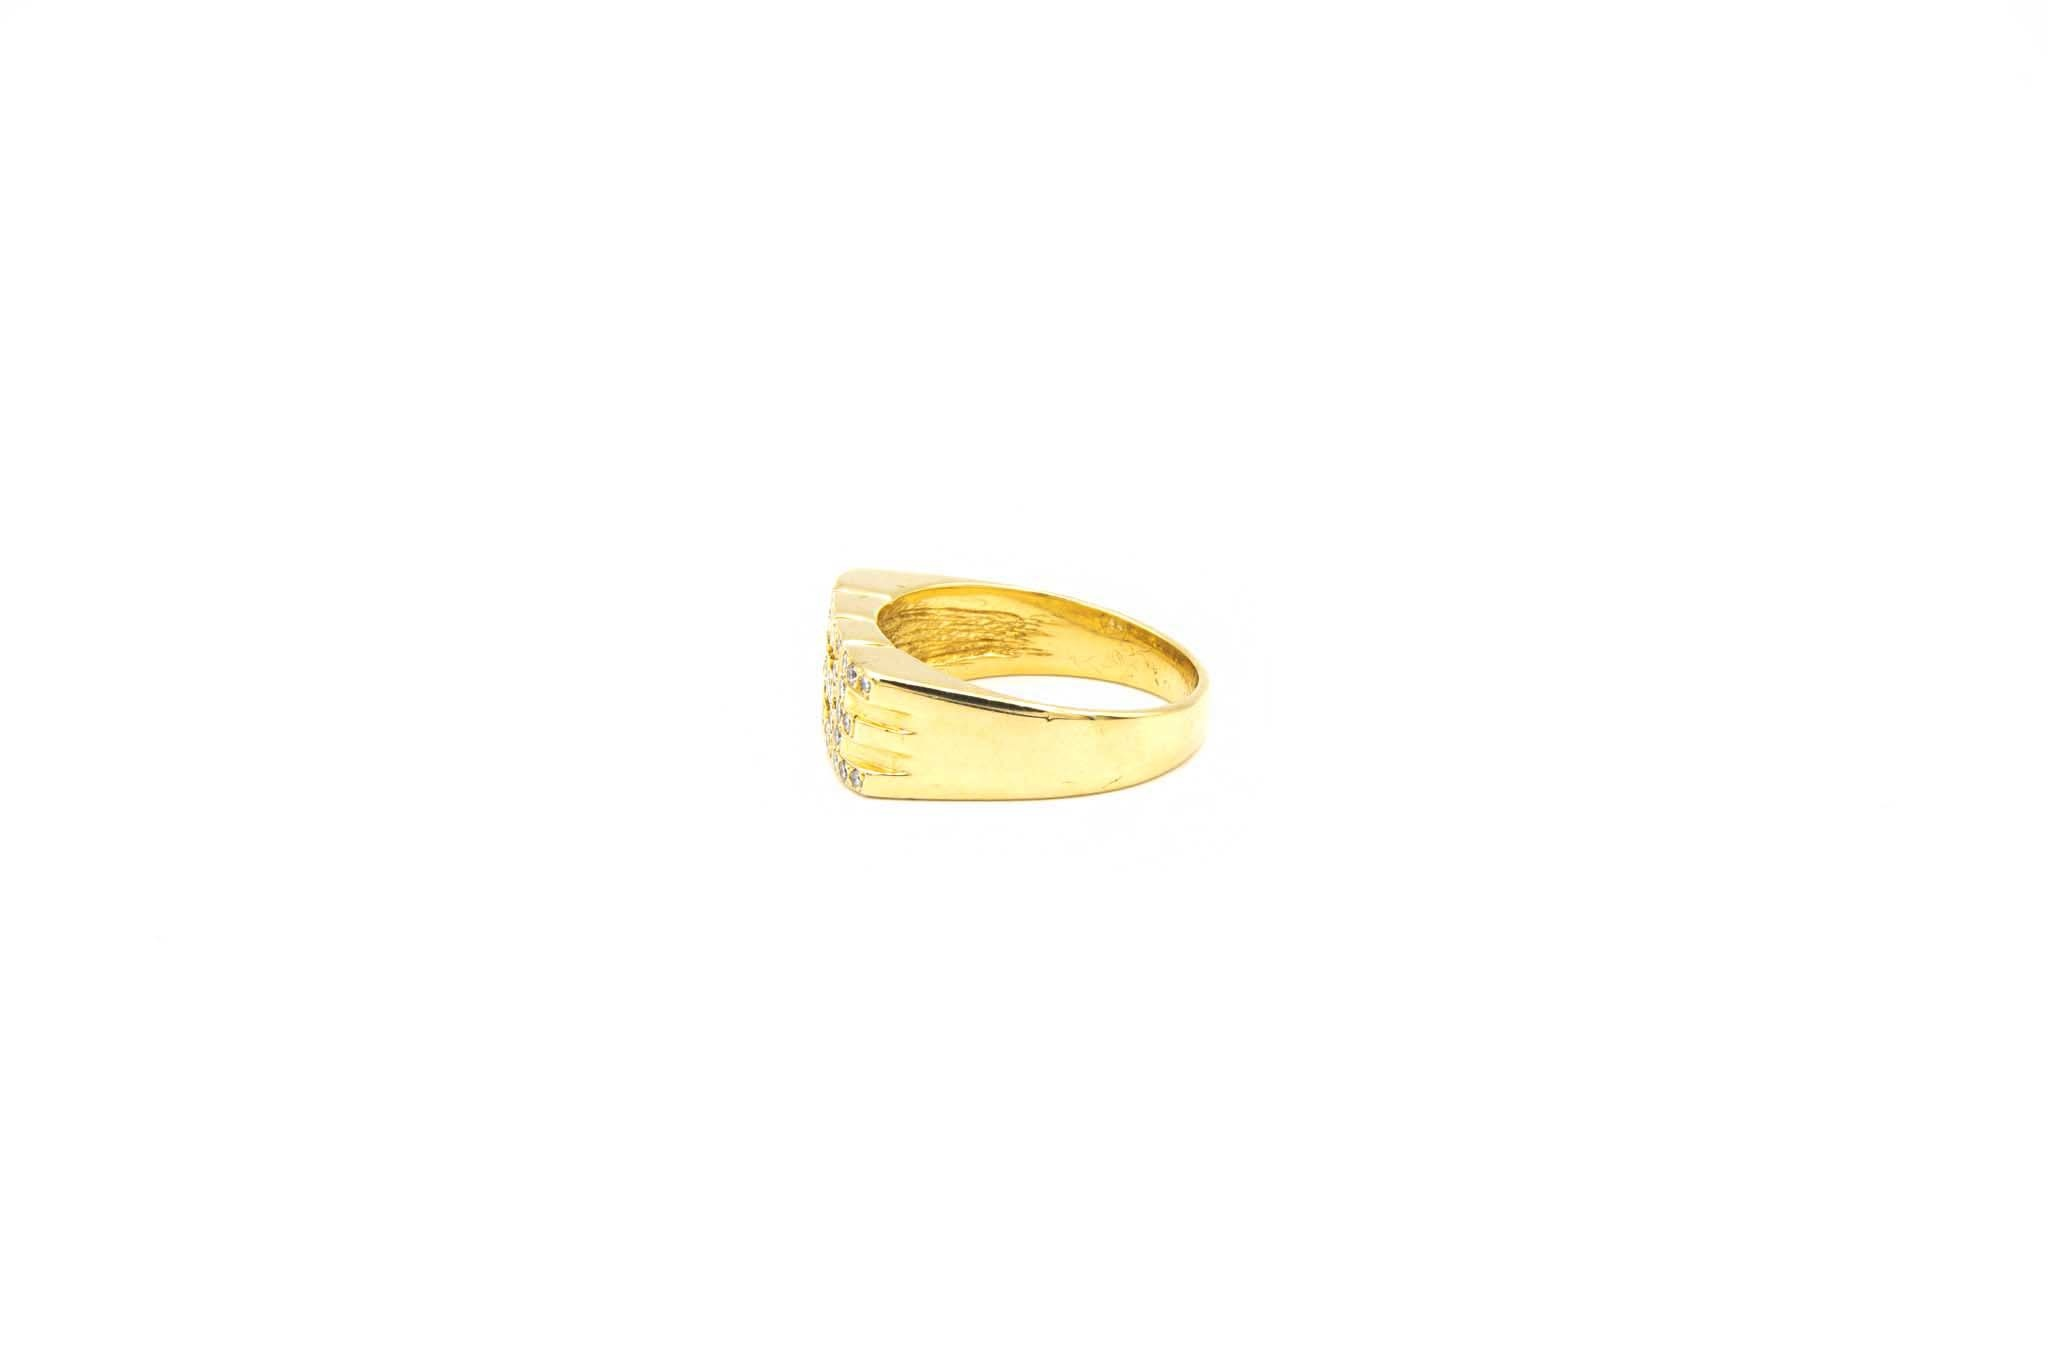 Ring fantasie opengewerkt met diamant-3